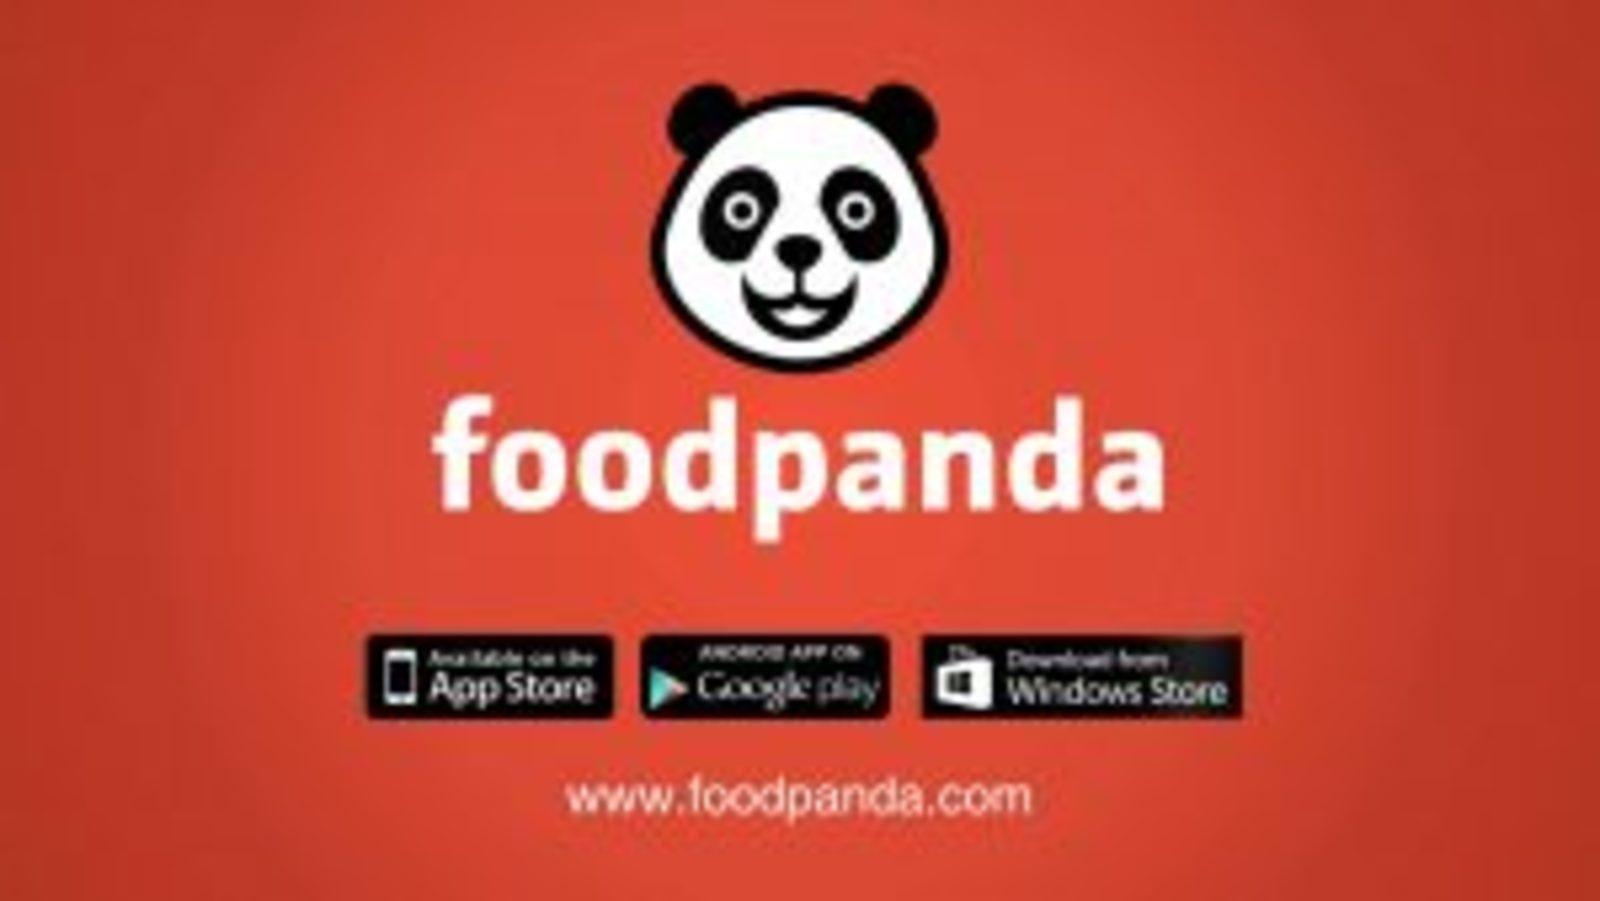 foodpanda image